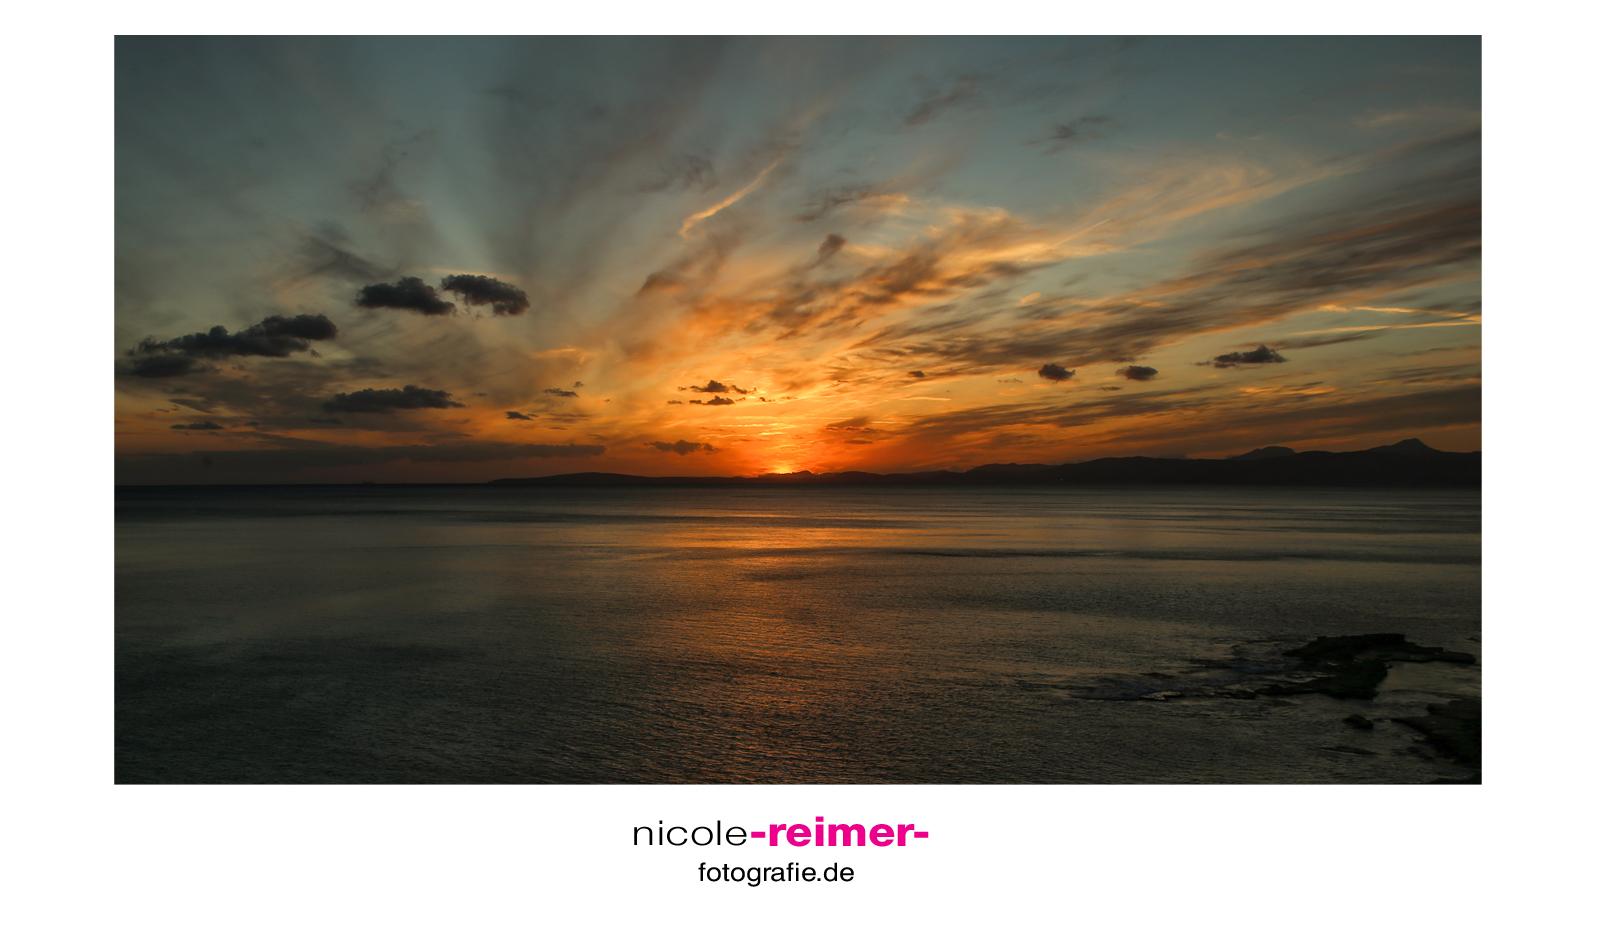 Puig-de-Ros-Sunset-2